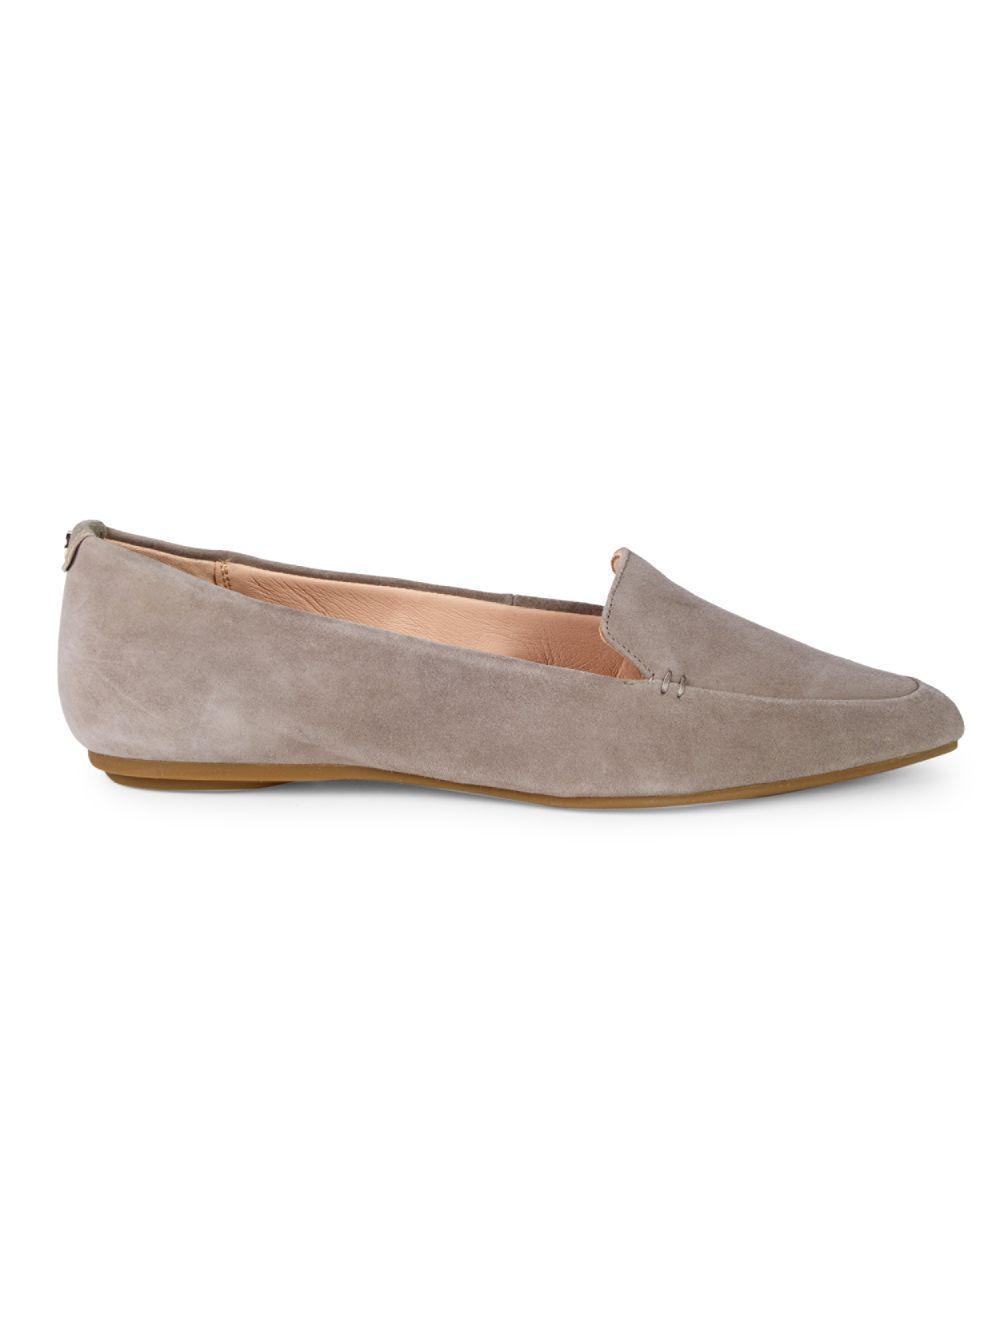 73c3fd272dd Lyst - Taryn Rose Faye Silky Suede Loafer Flat in Gray - Save 50%